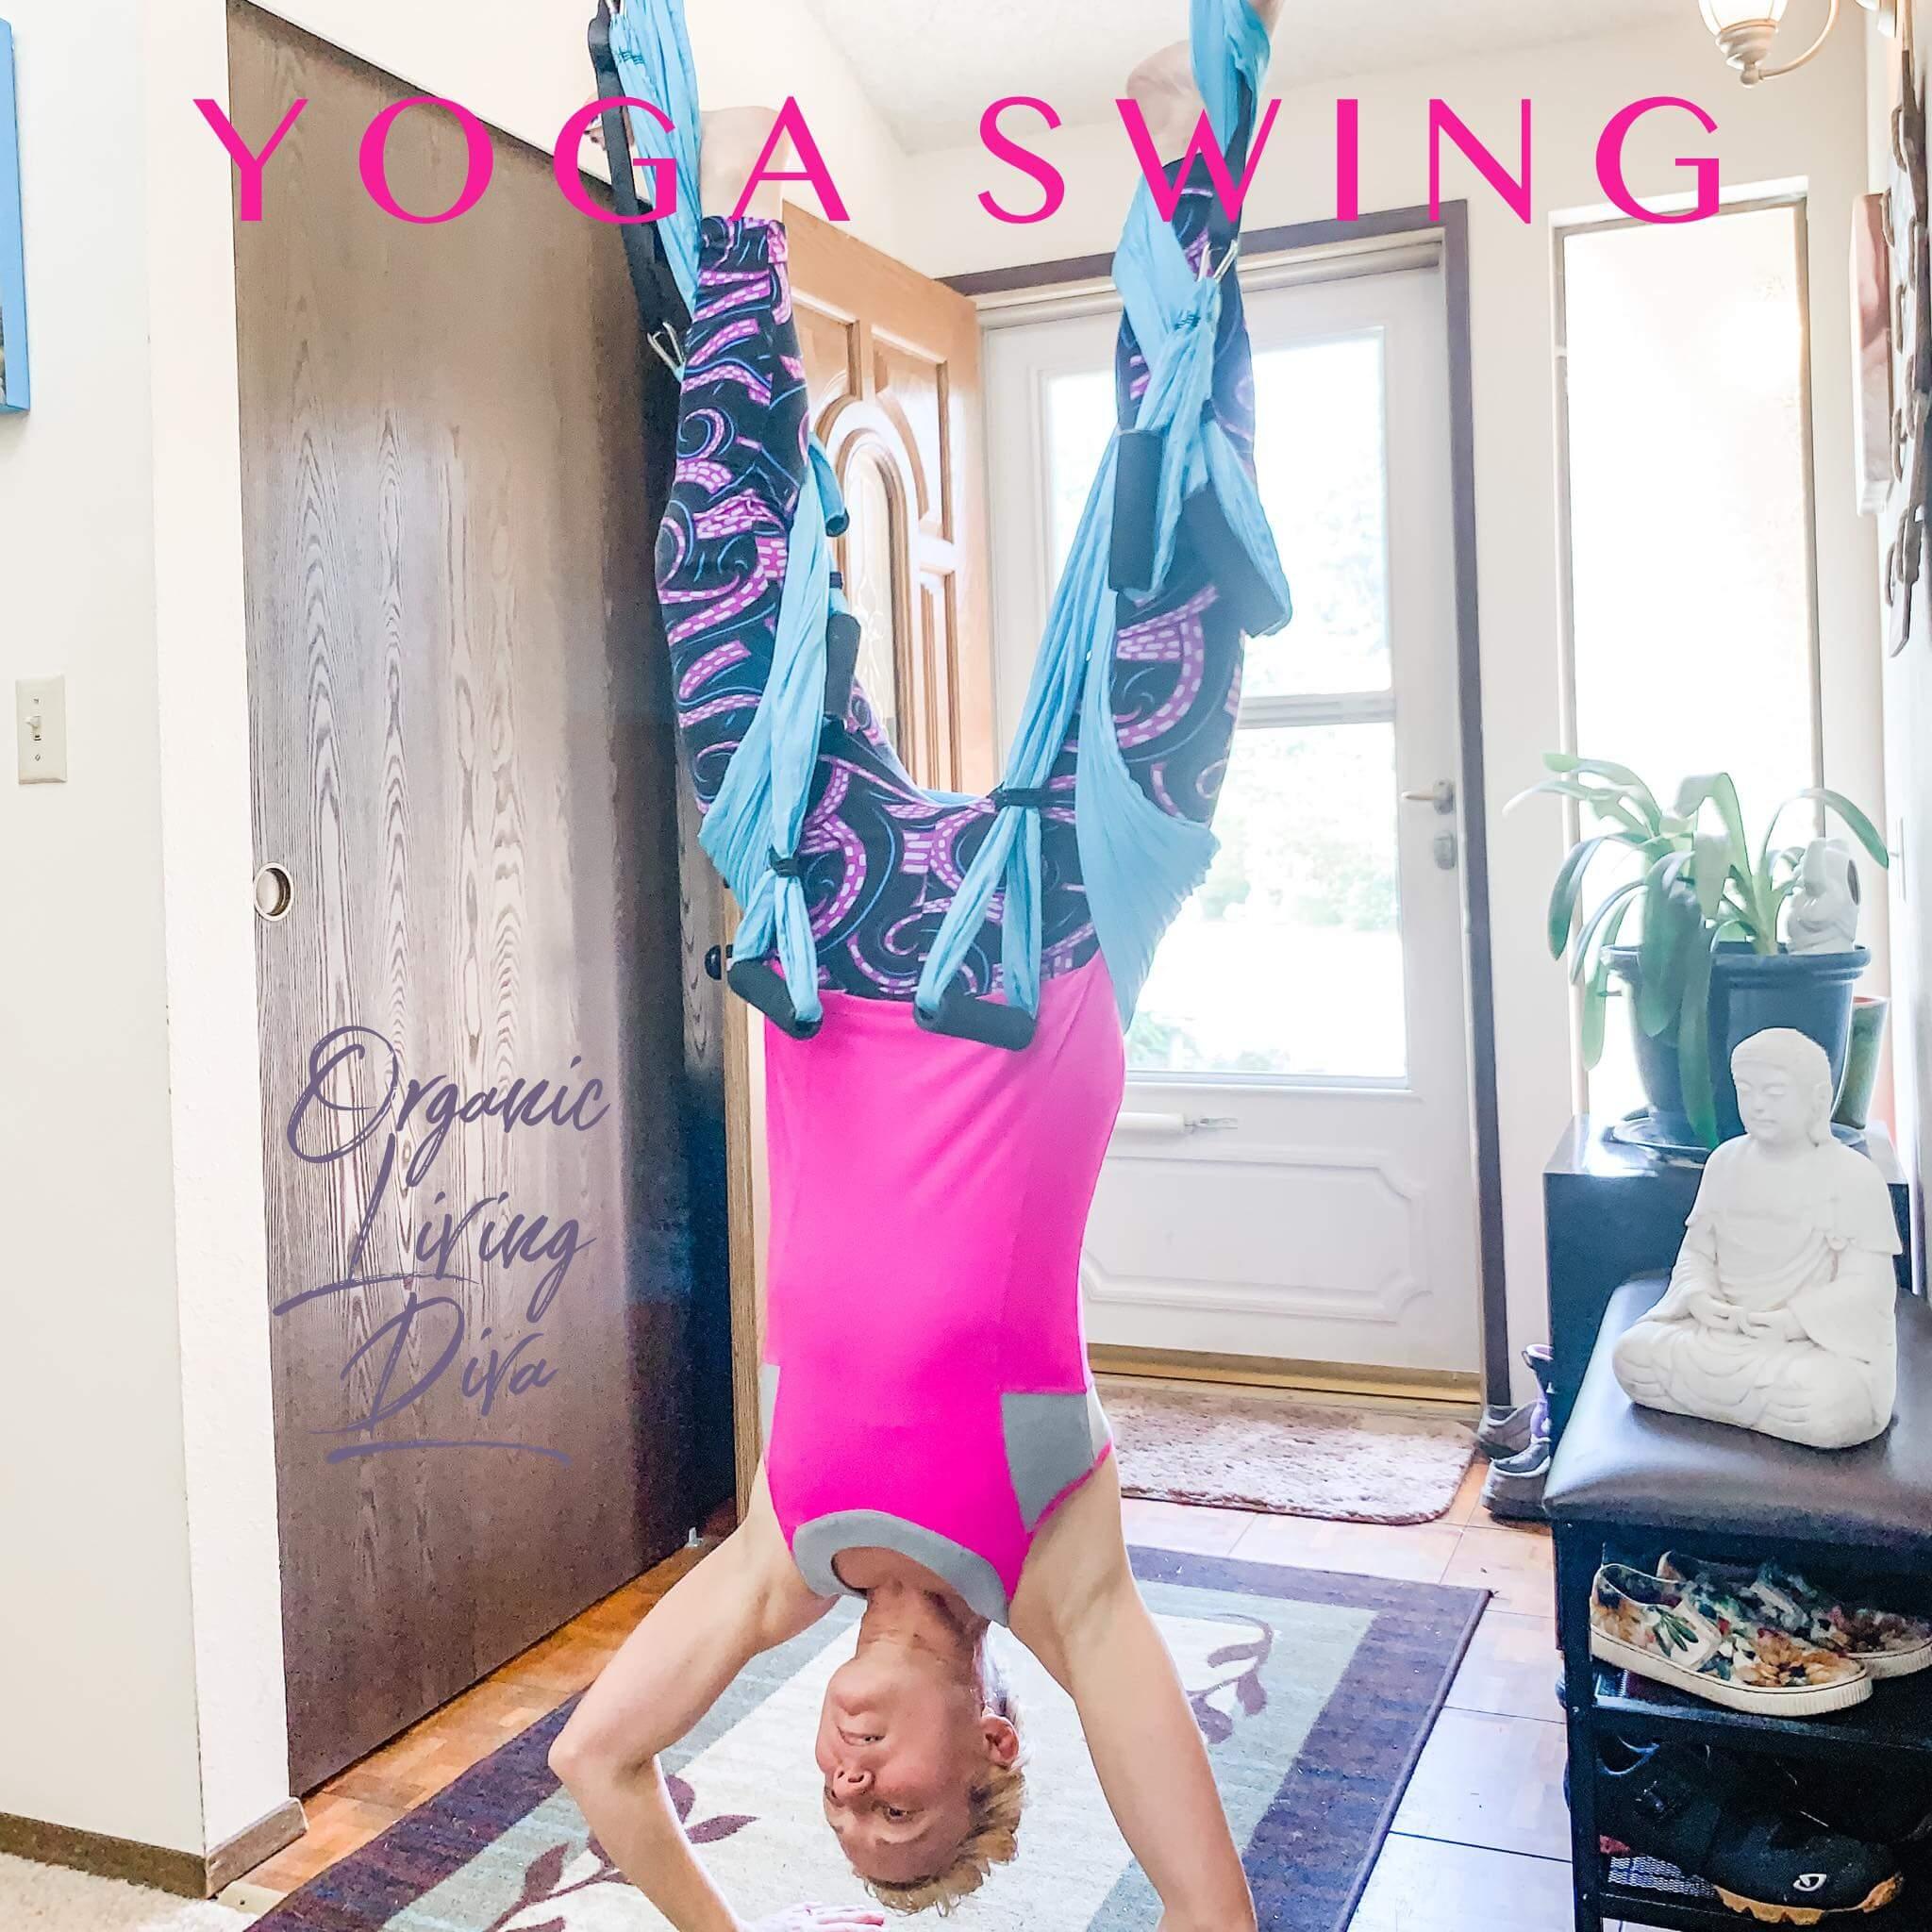 Yoga Swing Inversion